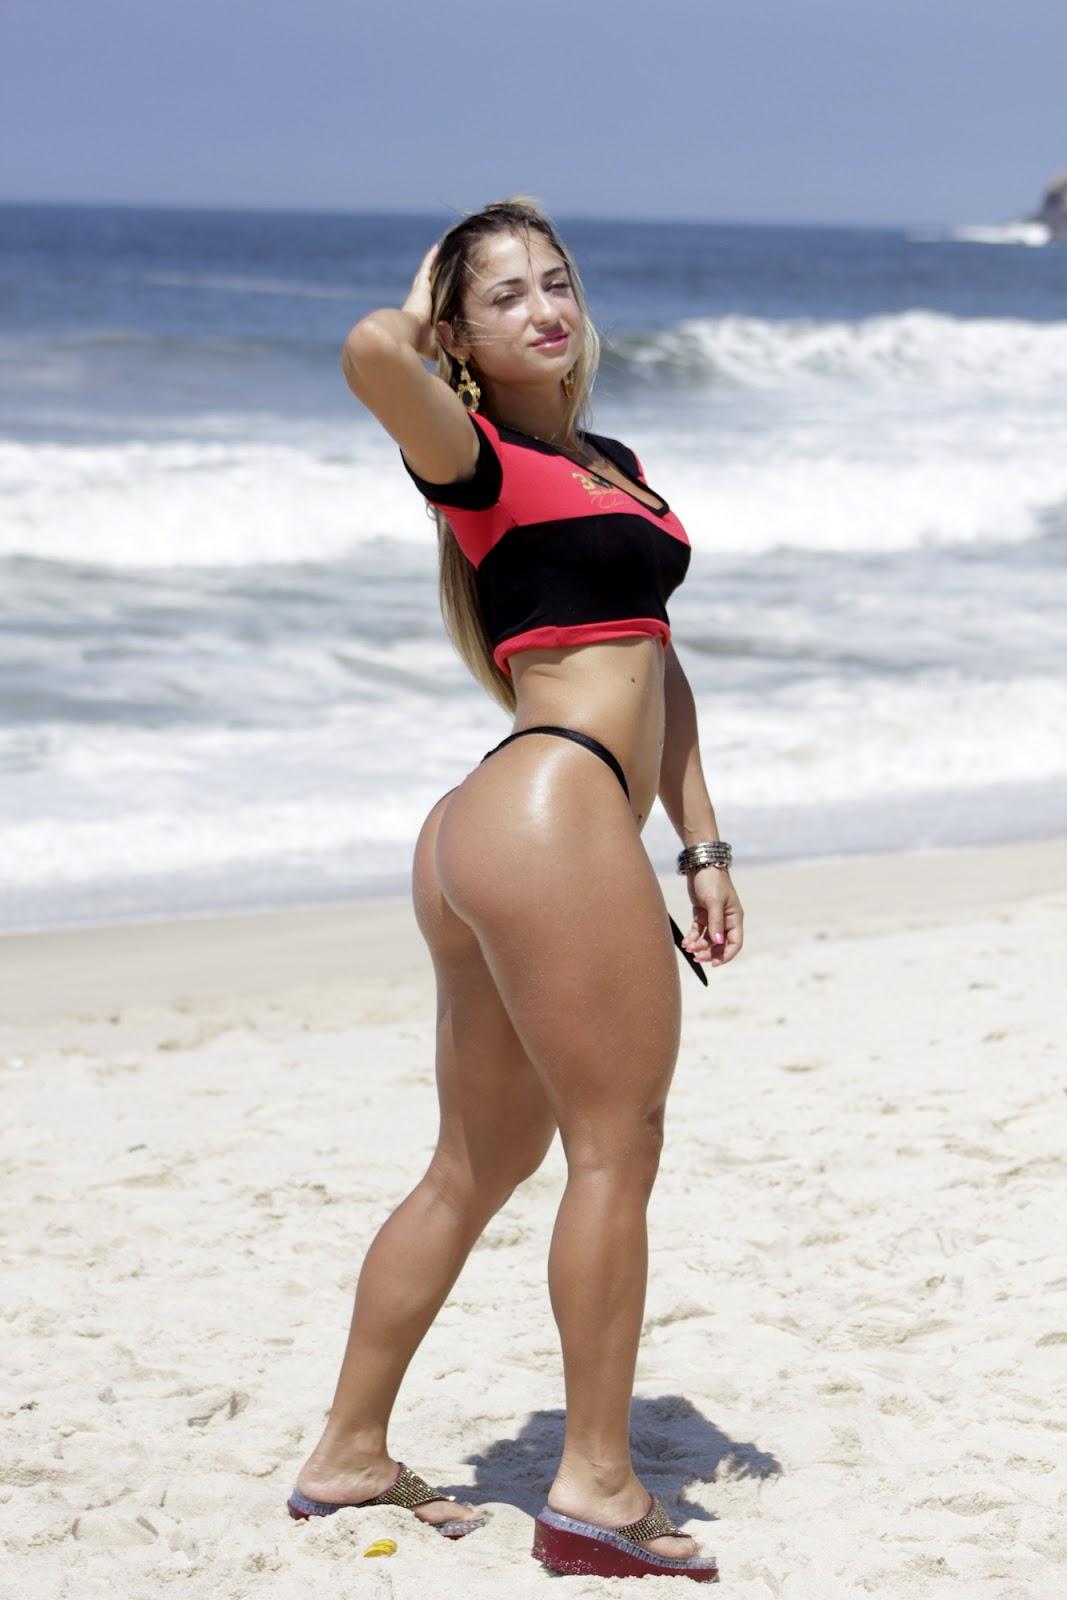 http://3.bp.blogspot.com/-dpmRMxKcDgE/UGPKEJWeKiI/AAAAAAAADpY/O0eXiHCmlkA/s1600/Priscila-Freitas-musa-do-Flamengo-+(4).JPG